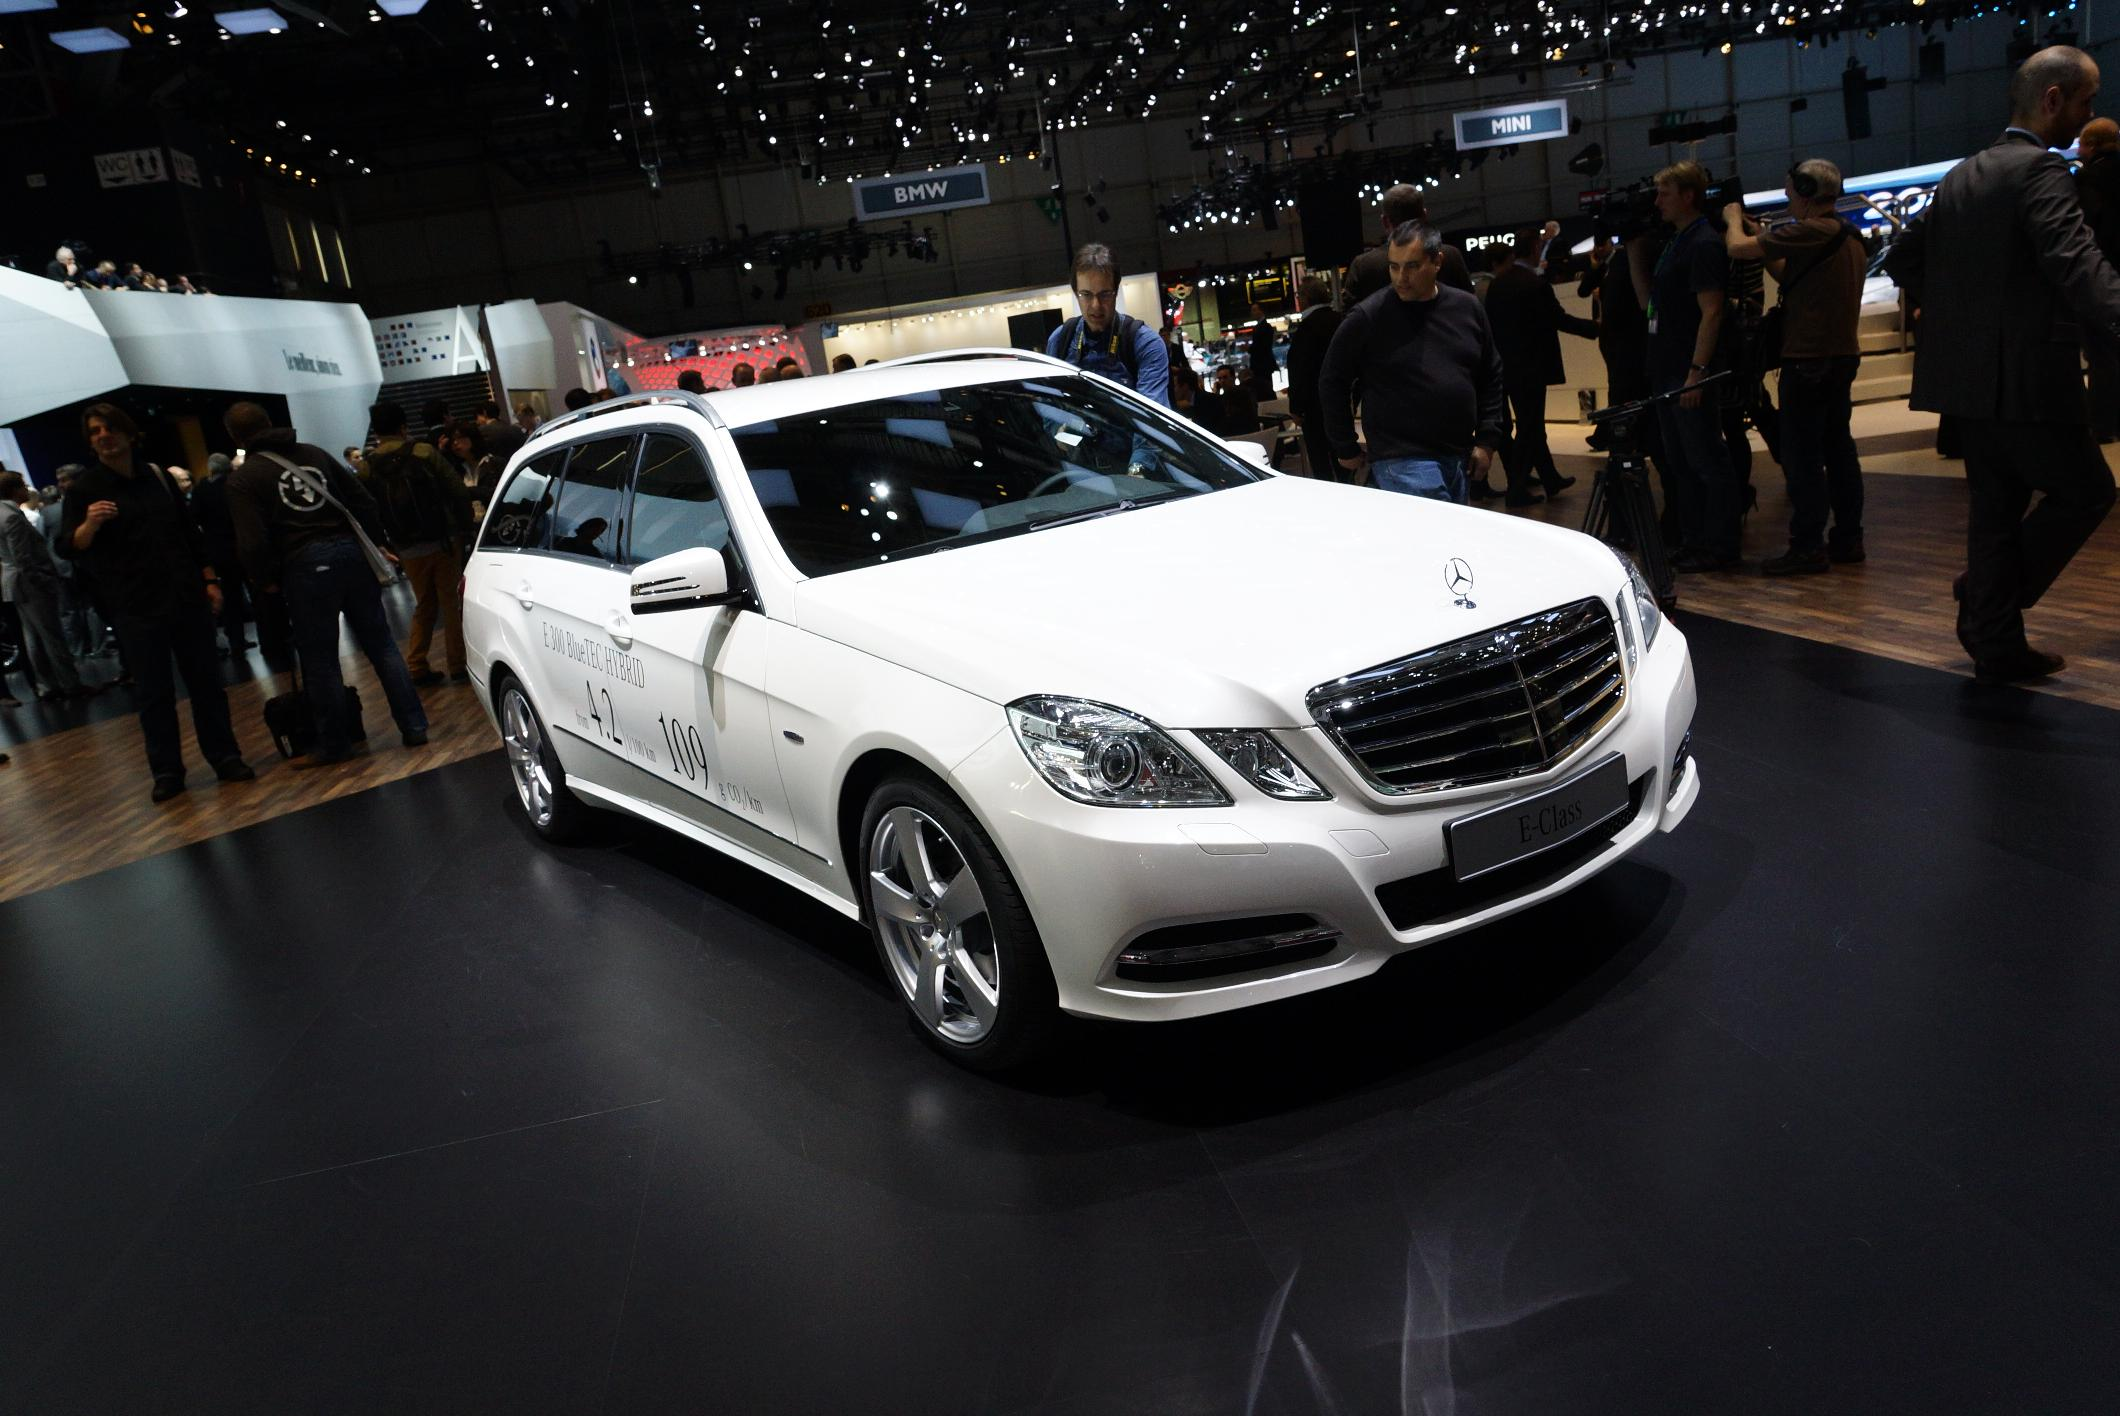 Mercedes E300 BlueTEC HYBRID Geneva 2012